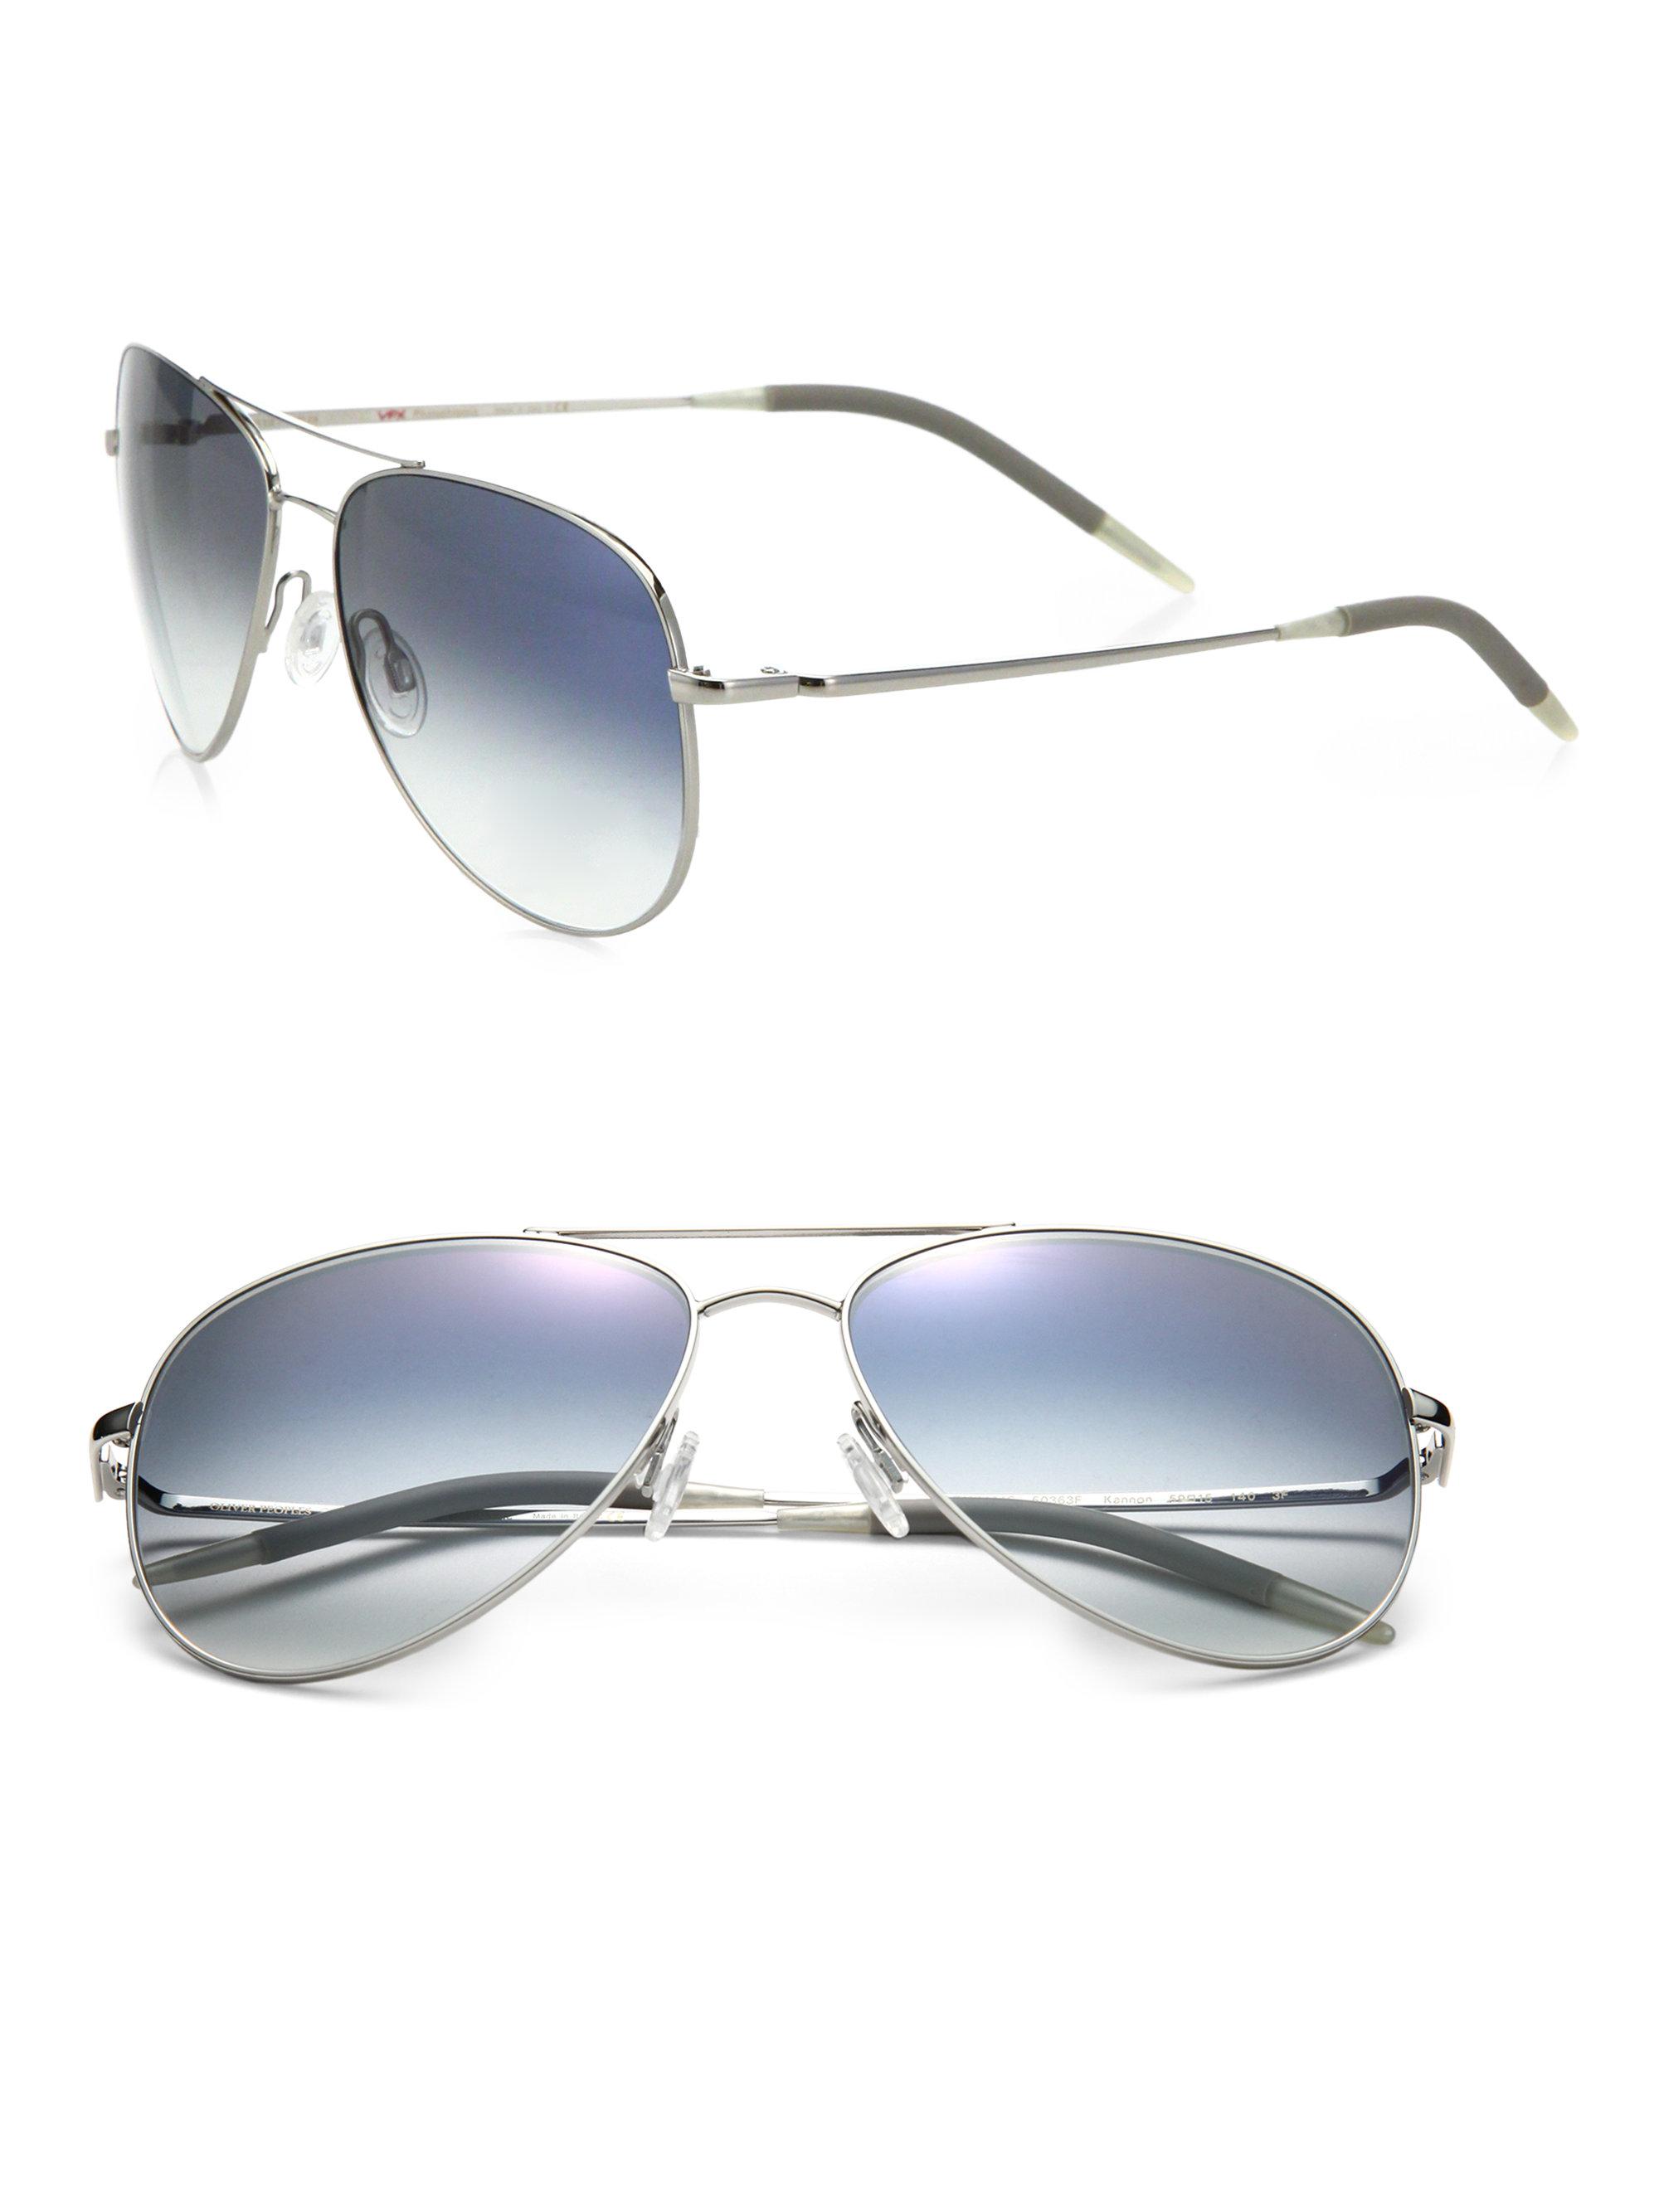 c0ad0791738 Oliver peoples Kannon 59mm Double-bridge Aviator Sunglasses in Metallic